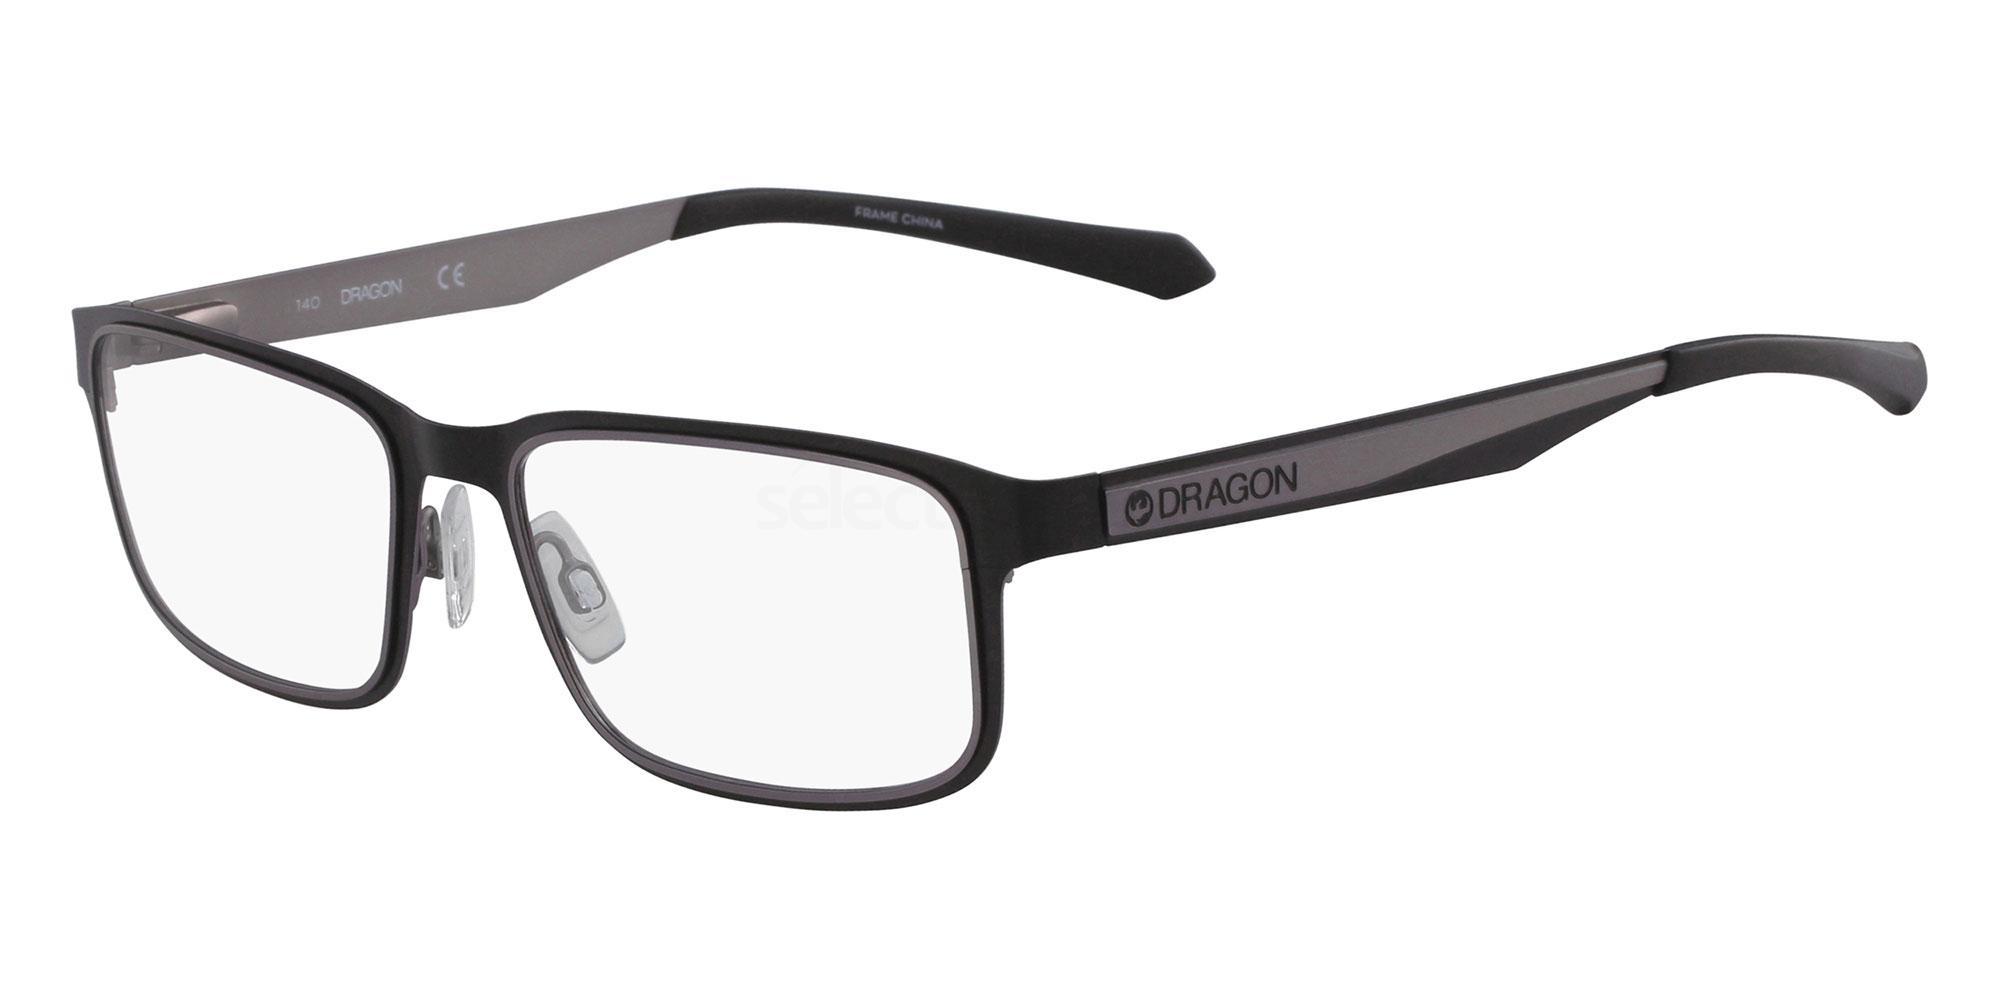 002 DR177 PAUL Glasses, Dragon